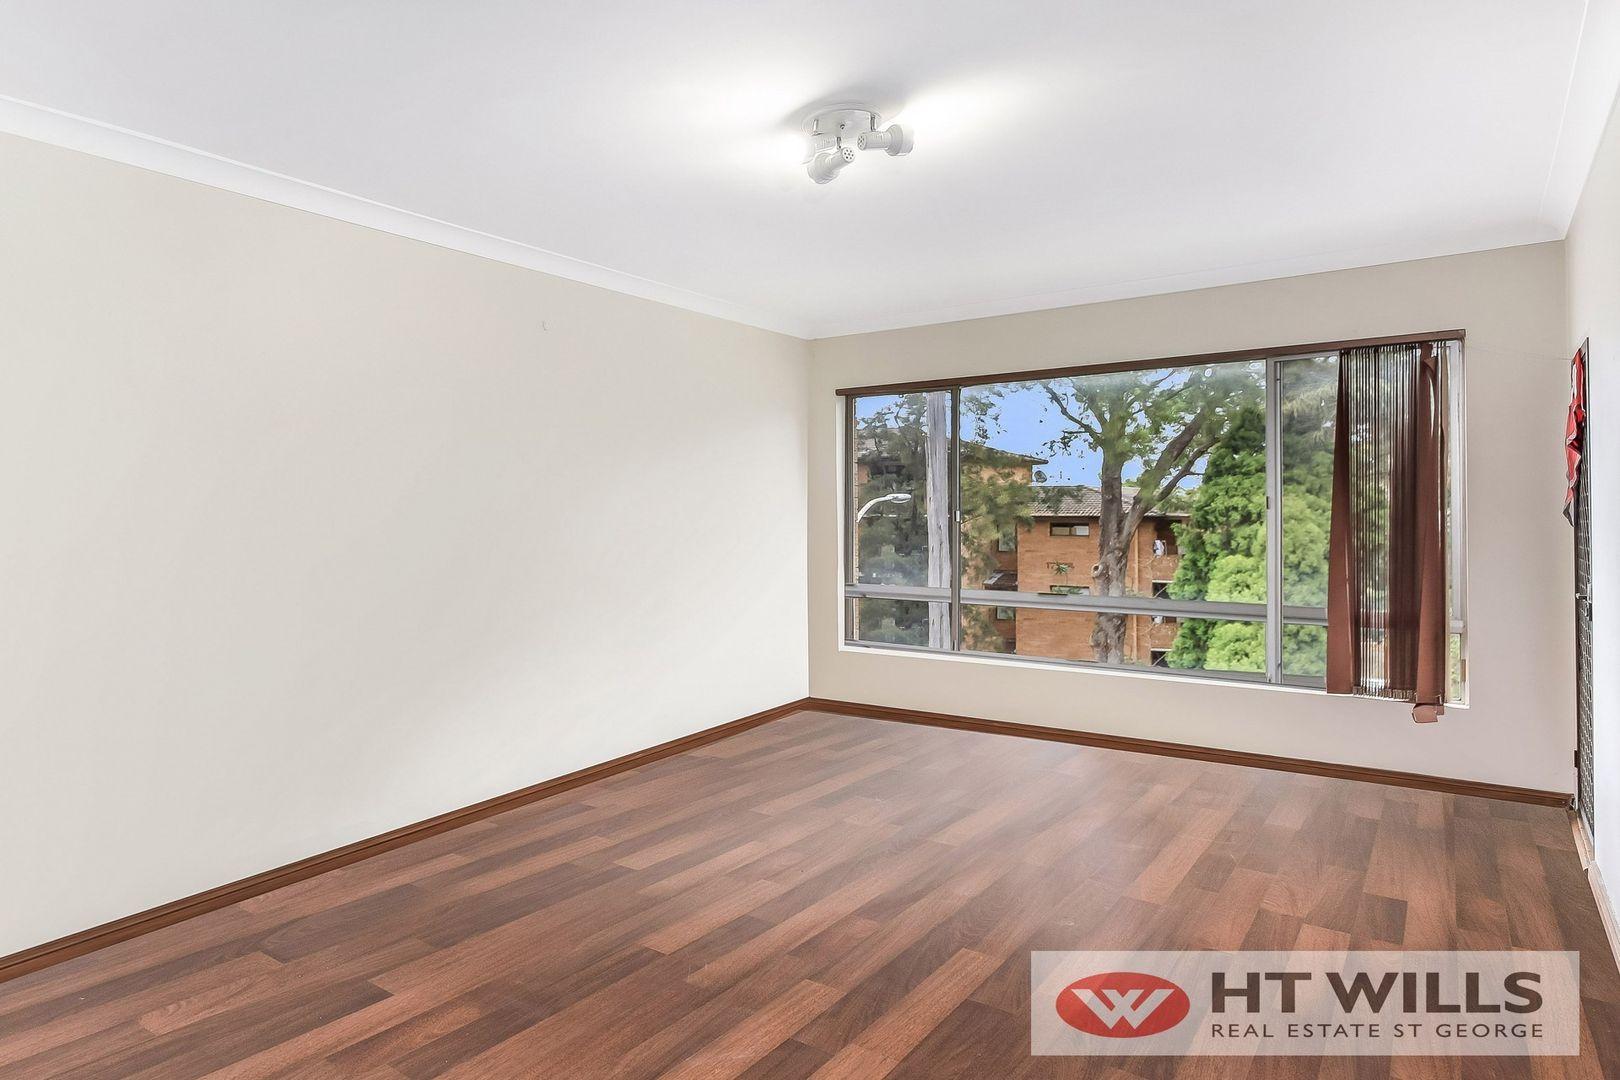 1/10 Woids Avenue, Hurstville NSW 2220, Image 1